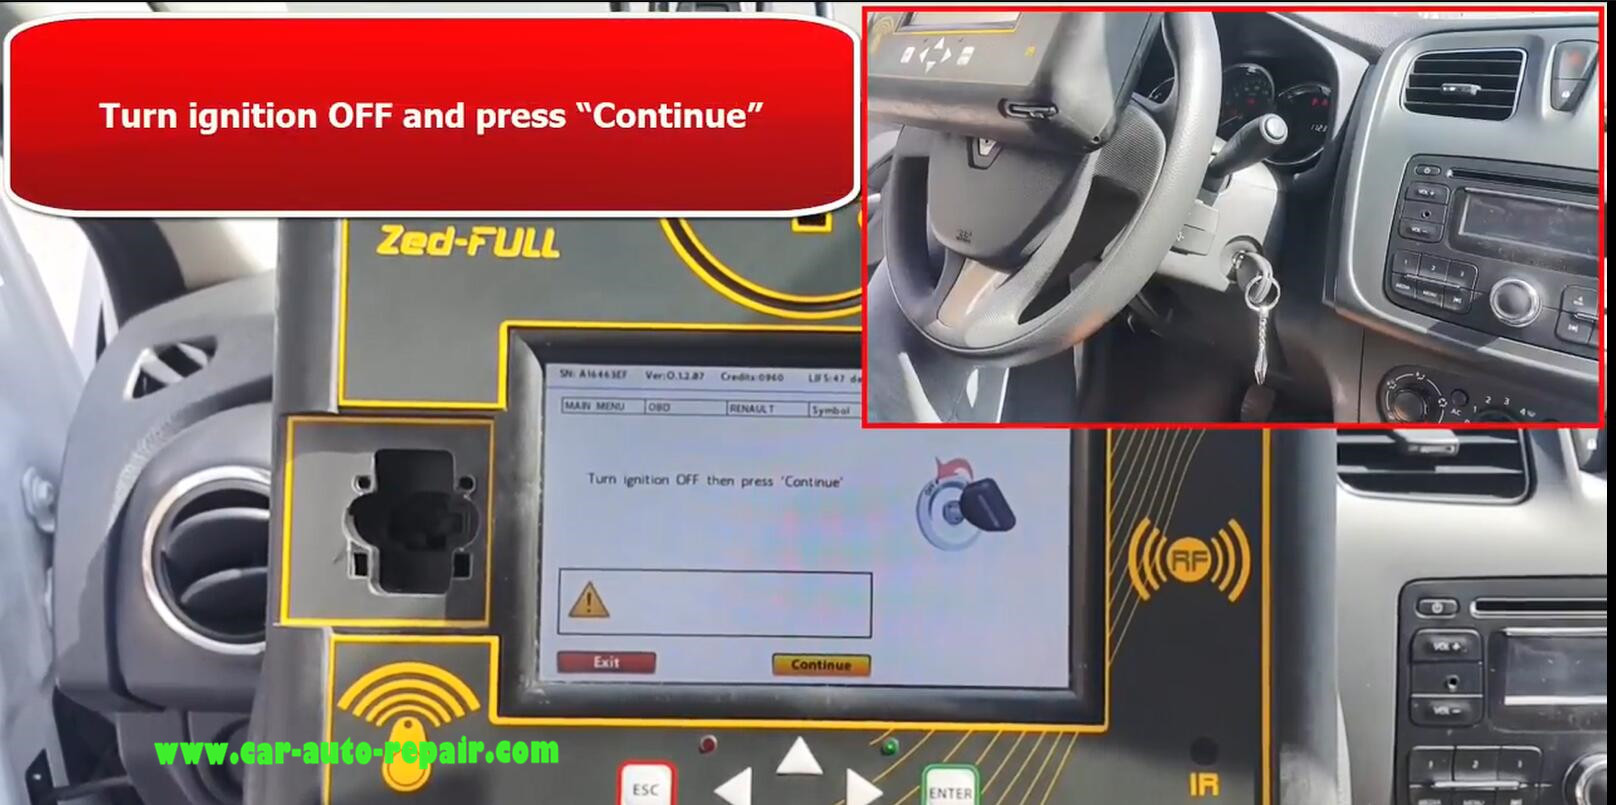 Renault SYMBOL 13+ Key Programming by Zed-Full Programmer (9)